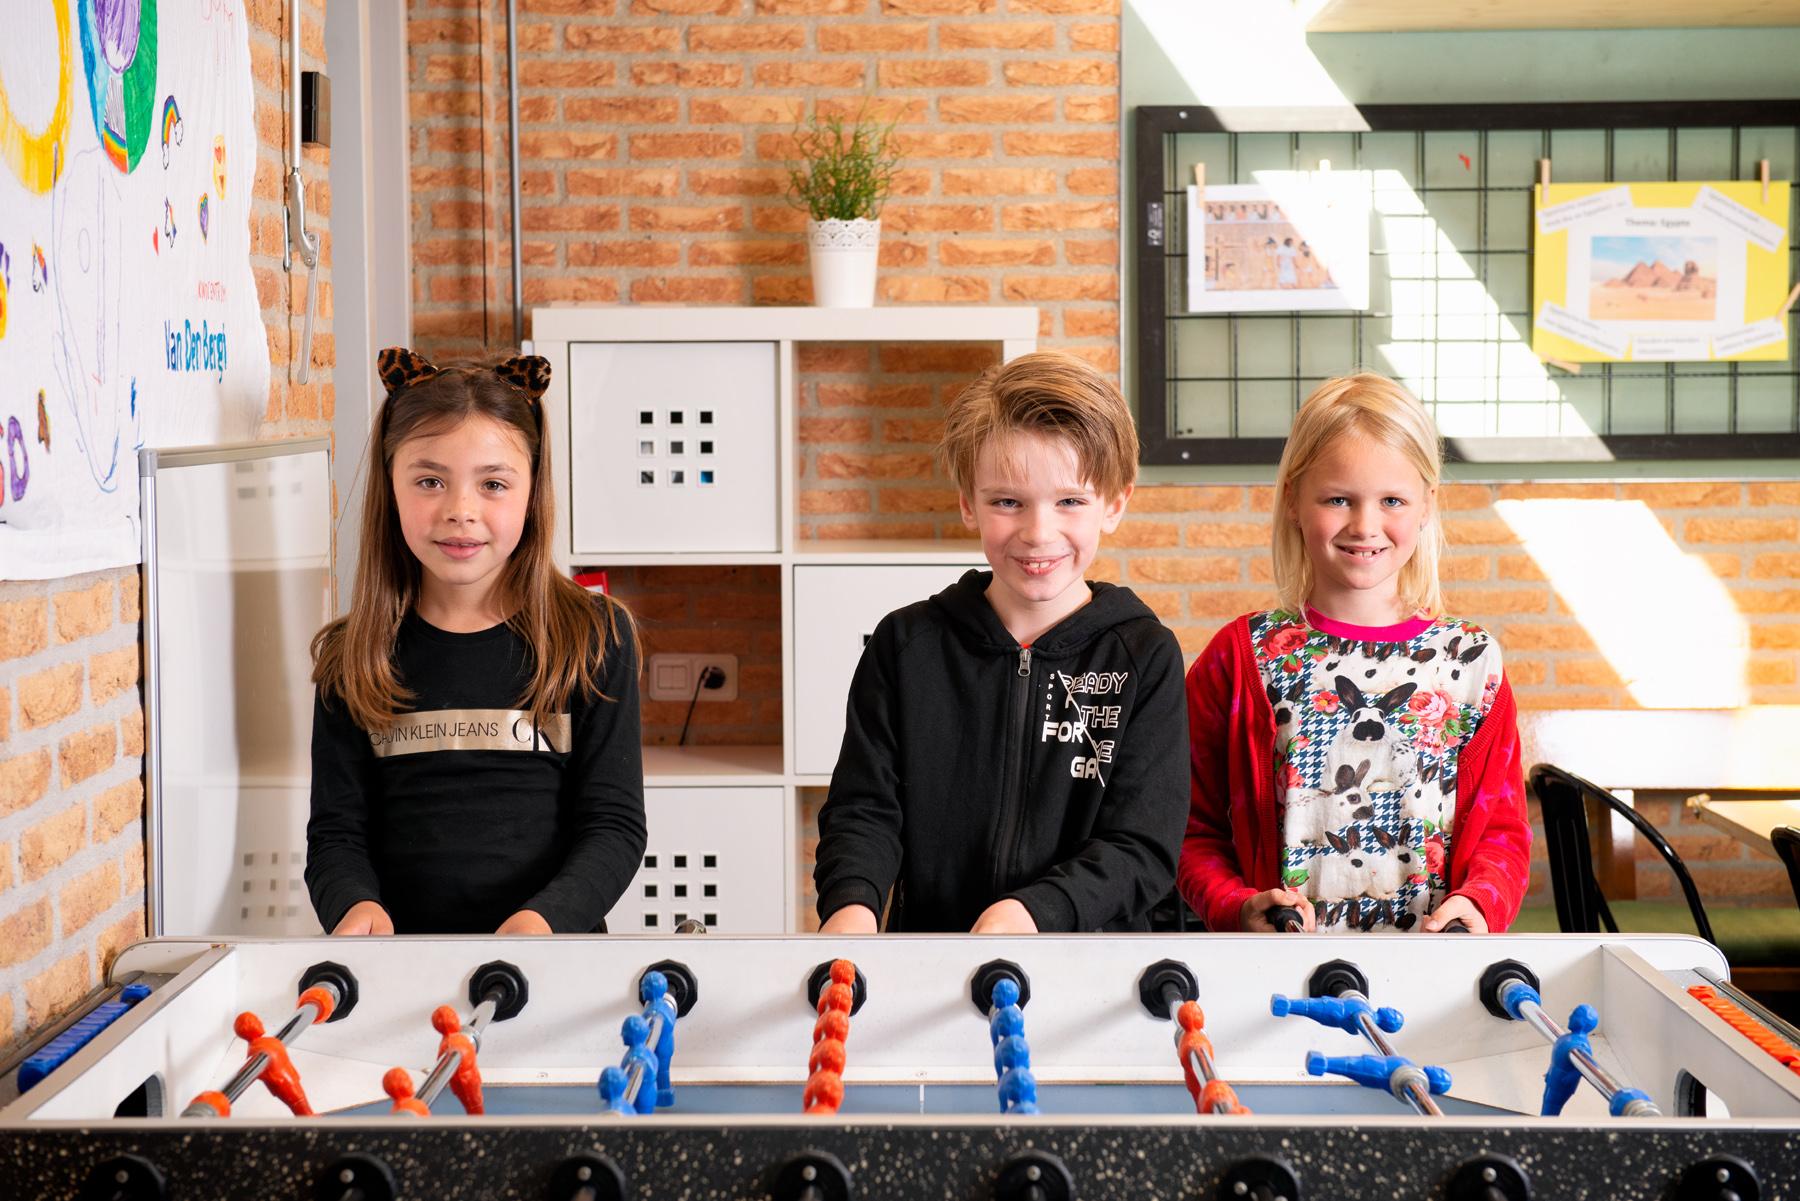 Kindcentrum Van Den Bergh 34 LR